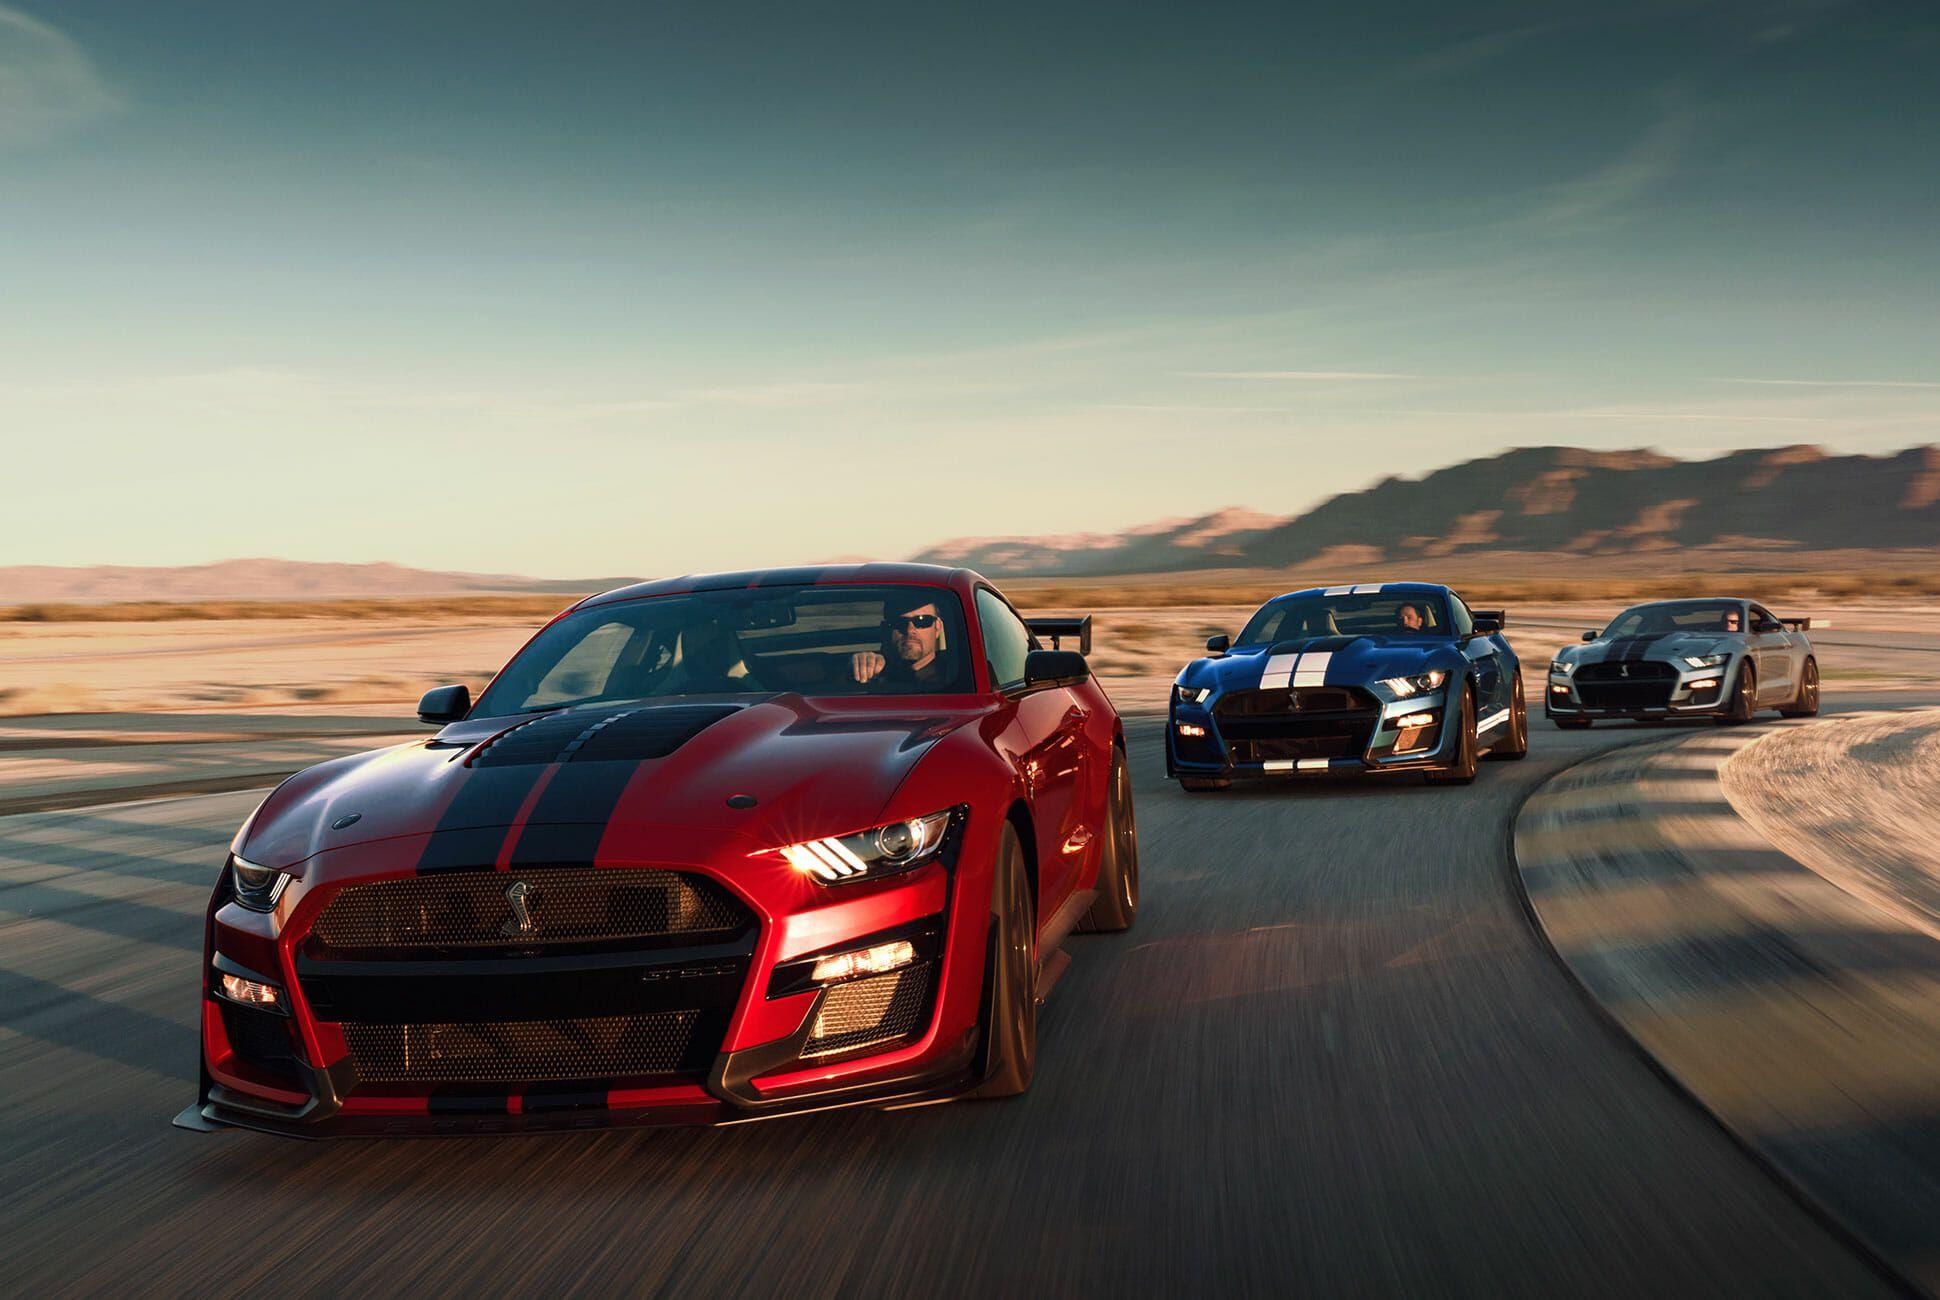 2020-Ford-Mustang-Shelby-GT500-gear-patrol-slide-2